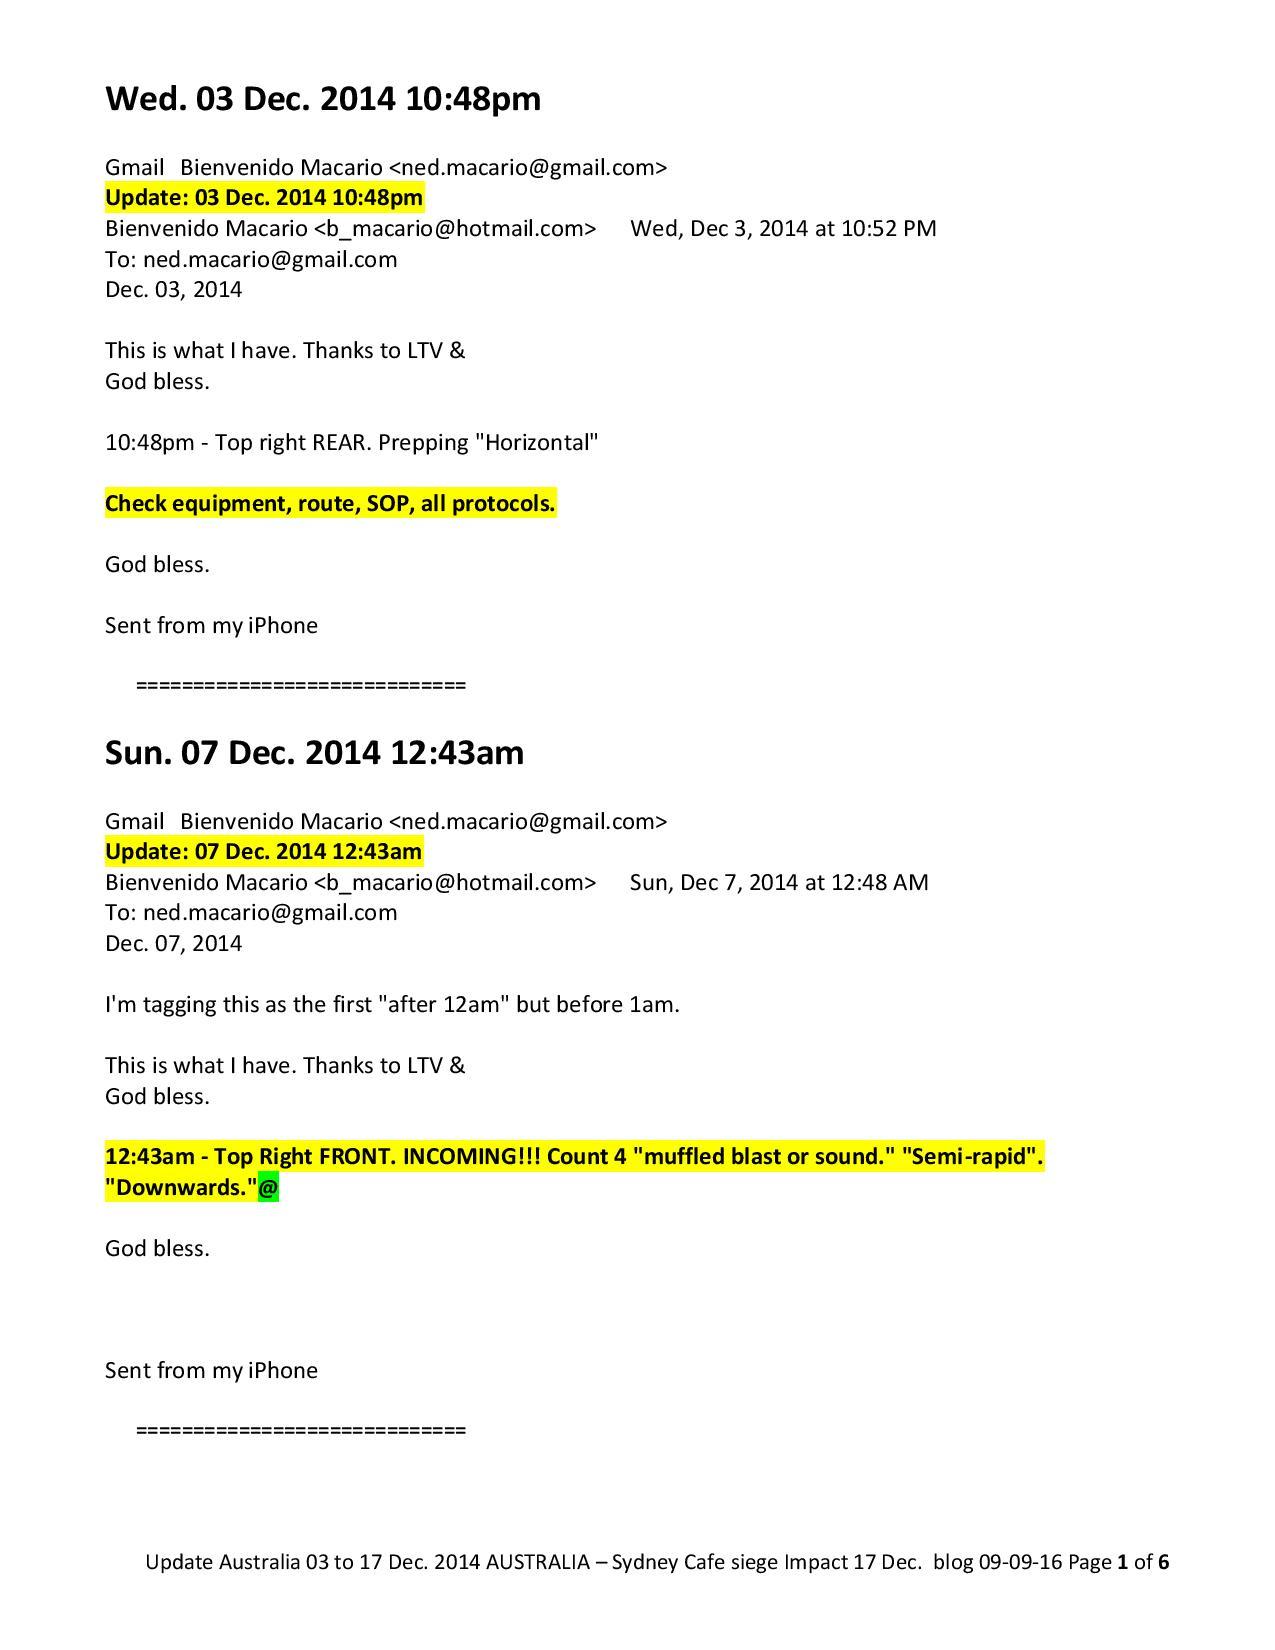 remote-viewing-australia-update-03-to-17-dec-2014-p1-sydney-cafe-siege-impact-date-17-dec-2014